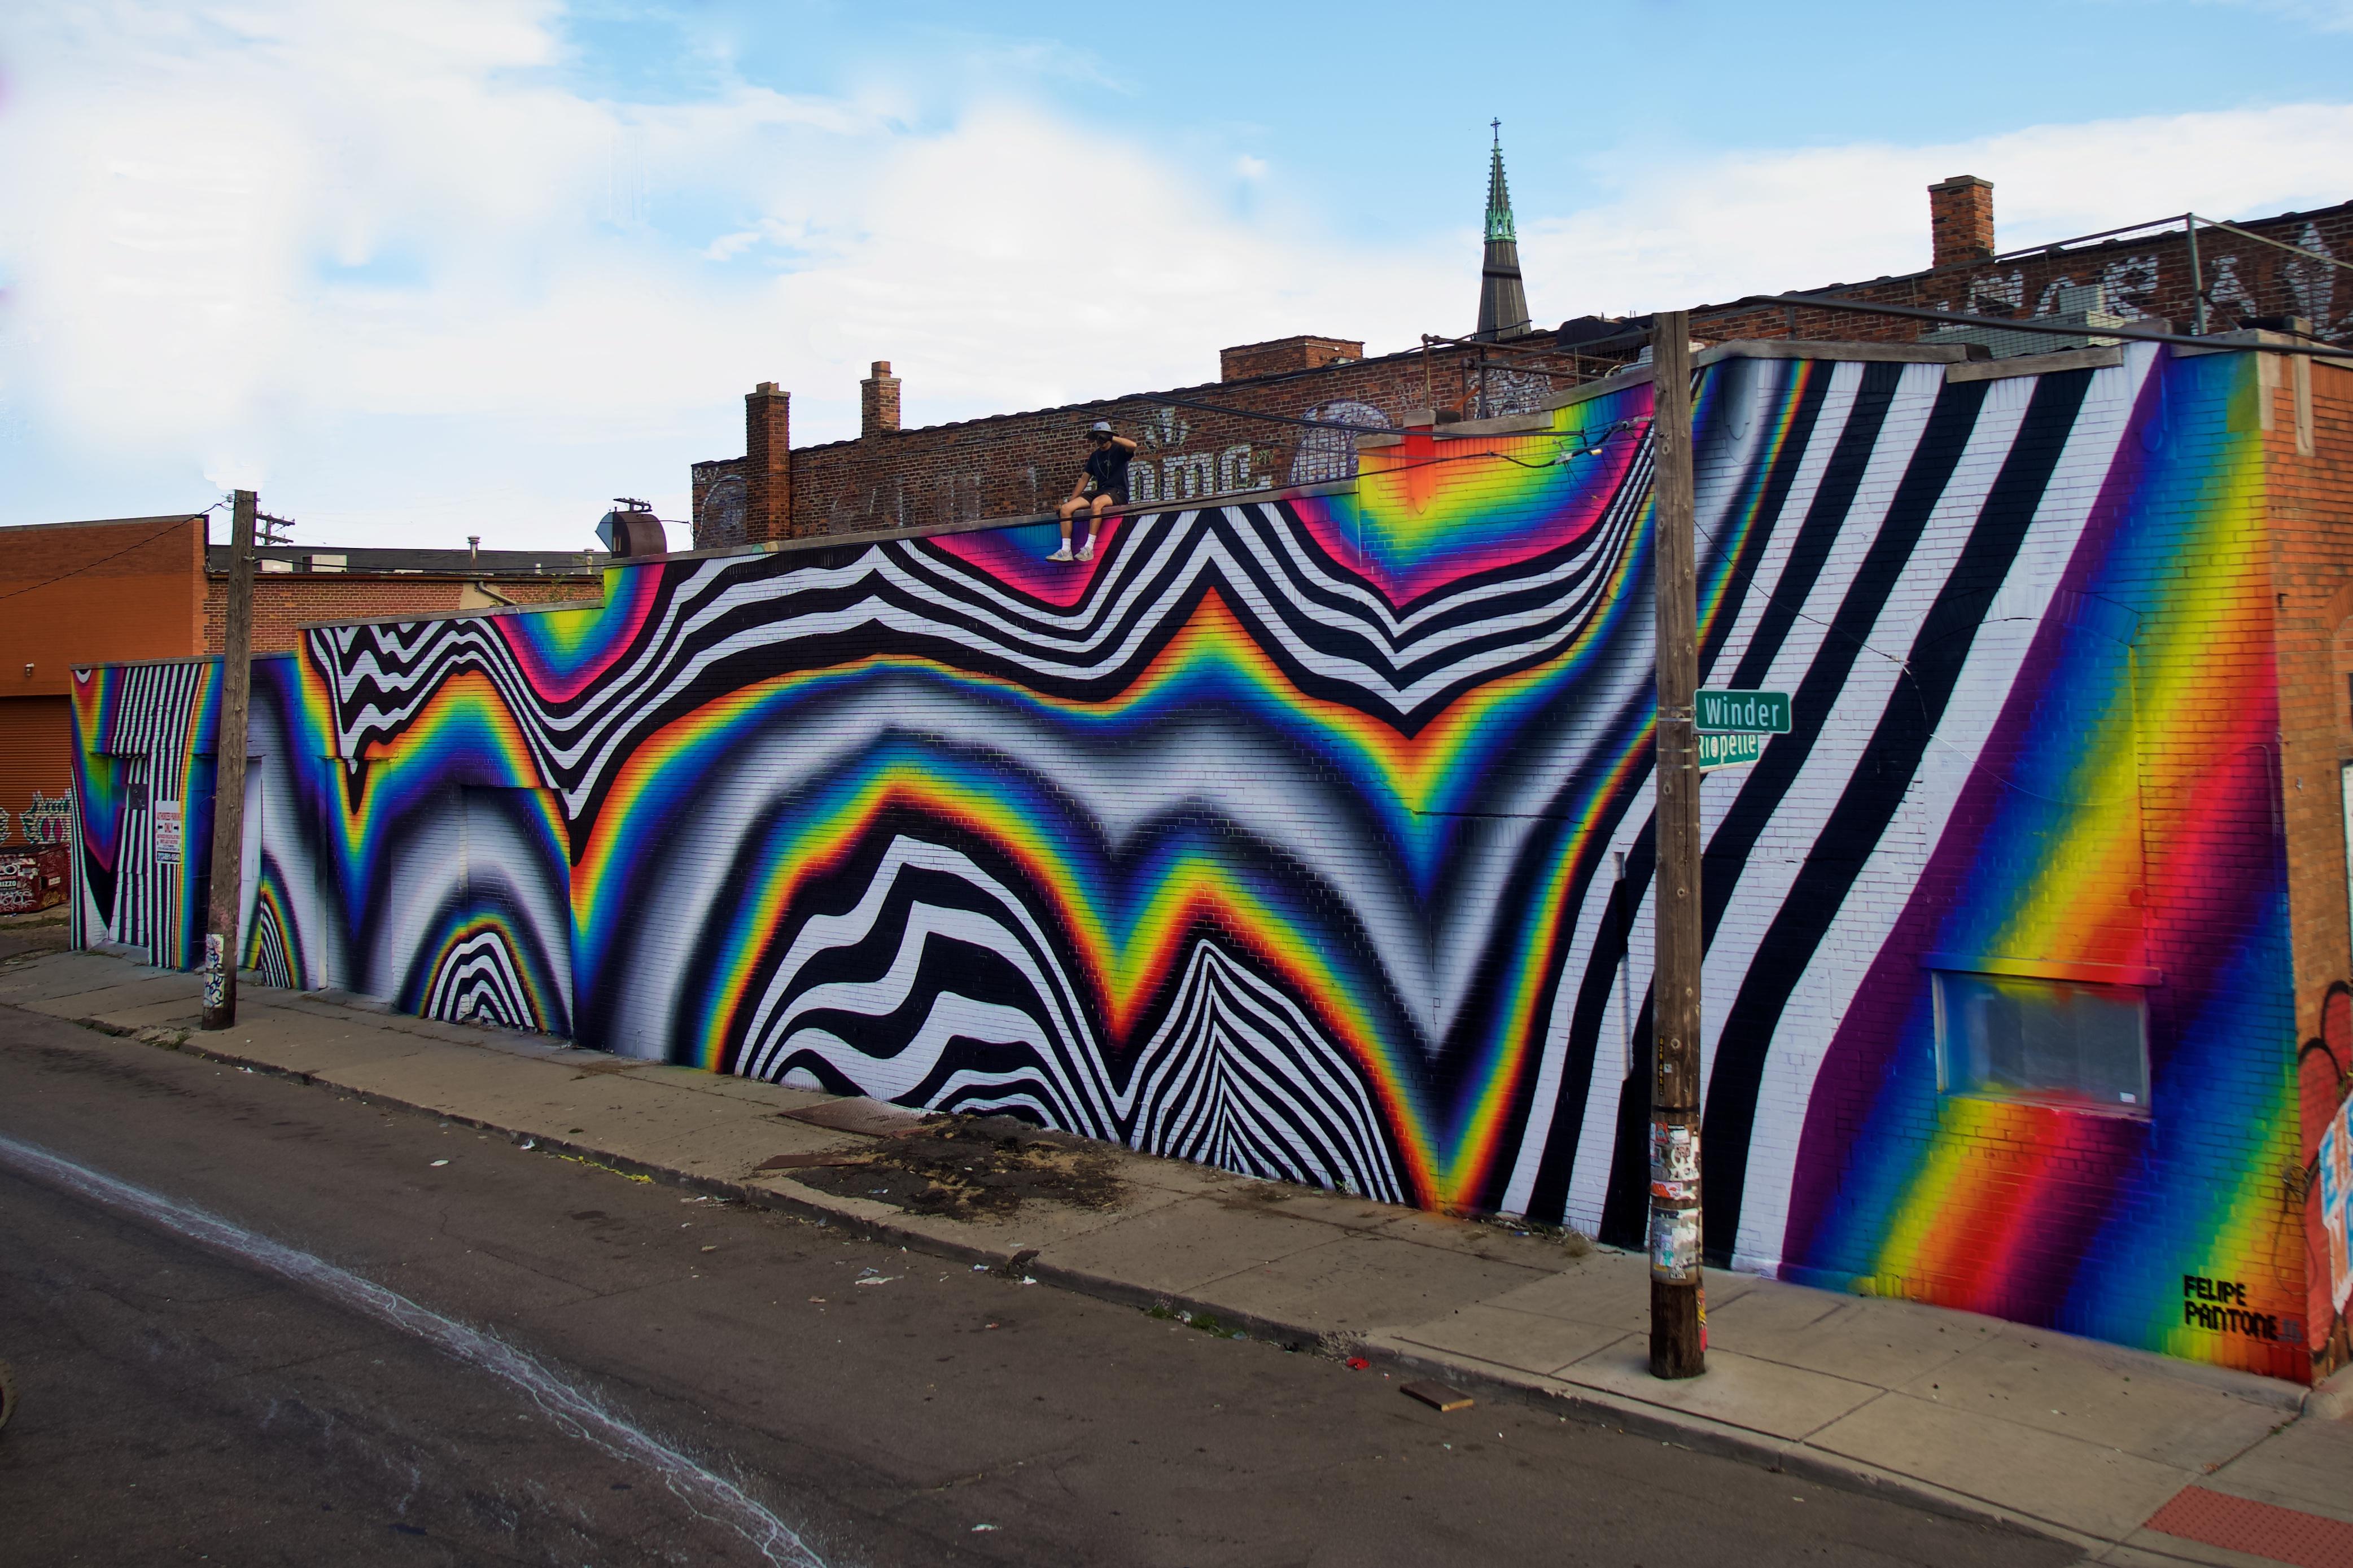 felipe-pantone_muralsinthemarket_1xrun_finished-walls